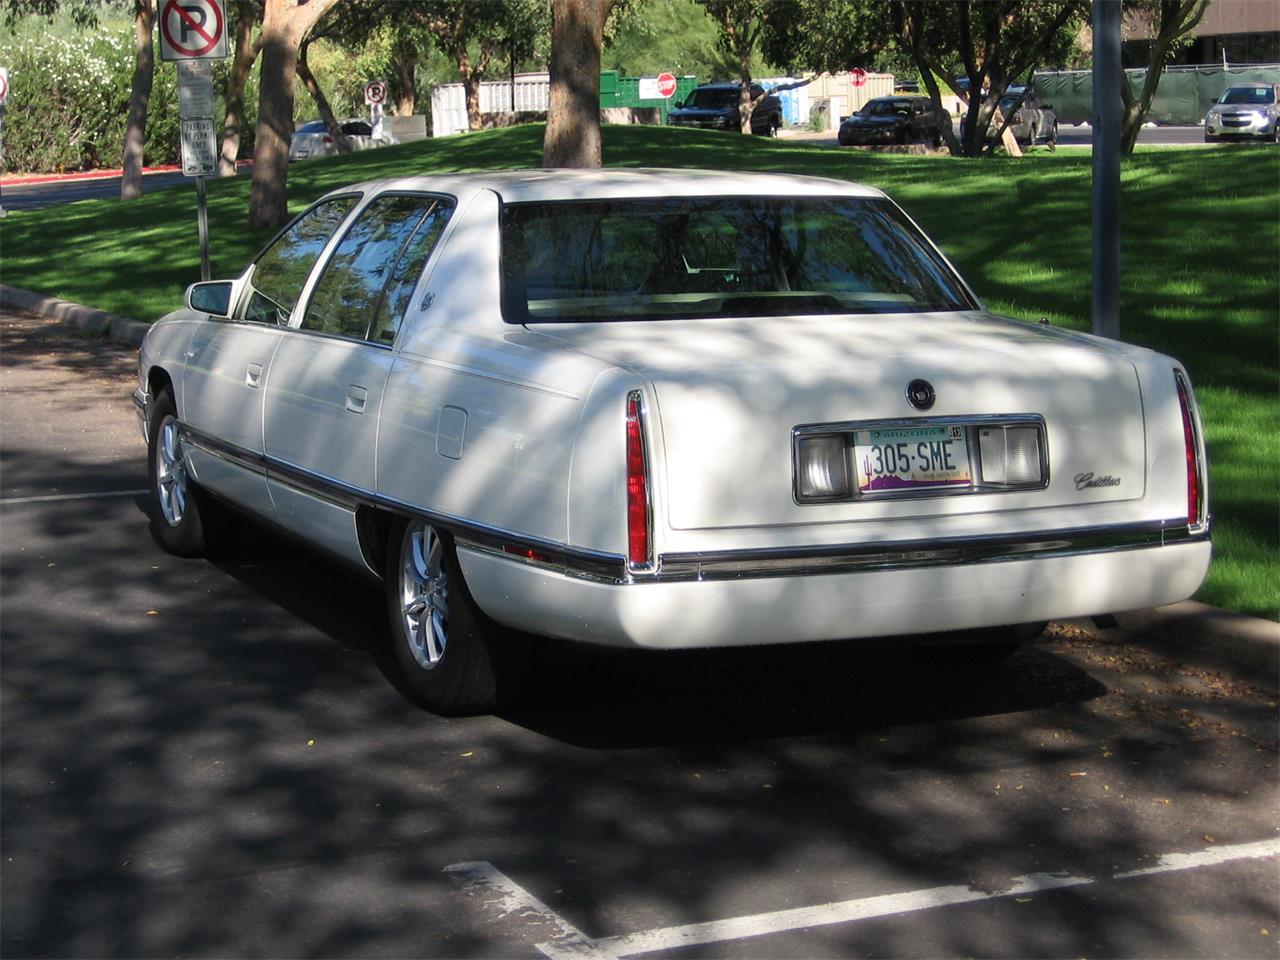 1995 Cadillac DeVille for Sale   ClassicCars.com   CC-1051576